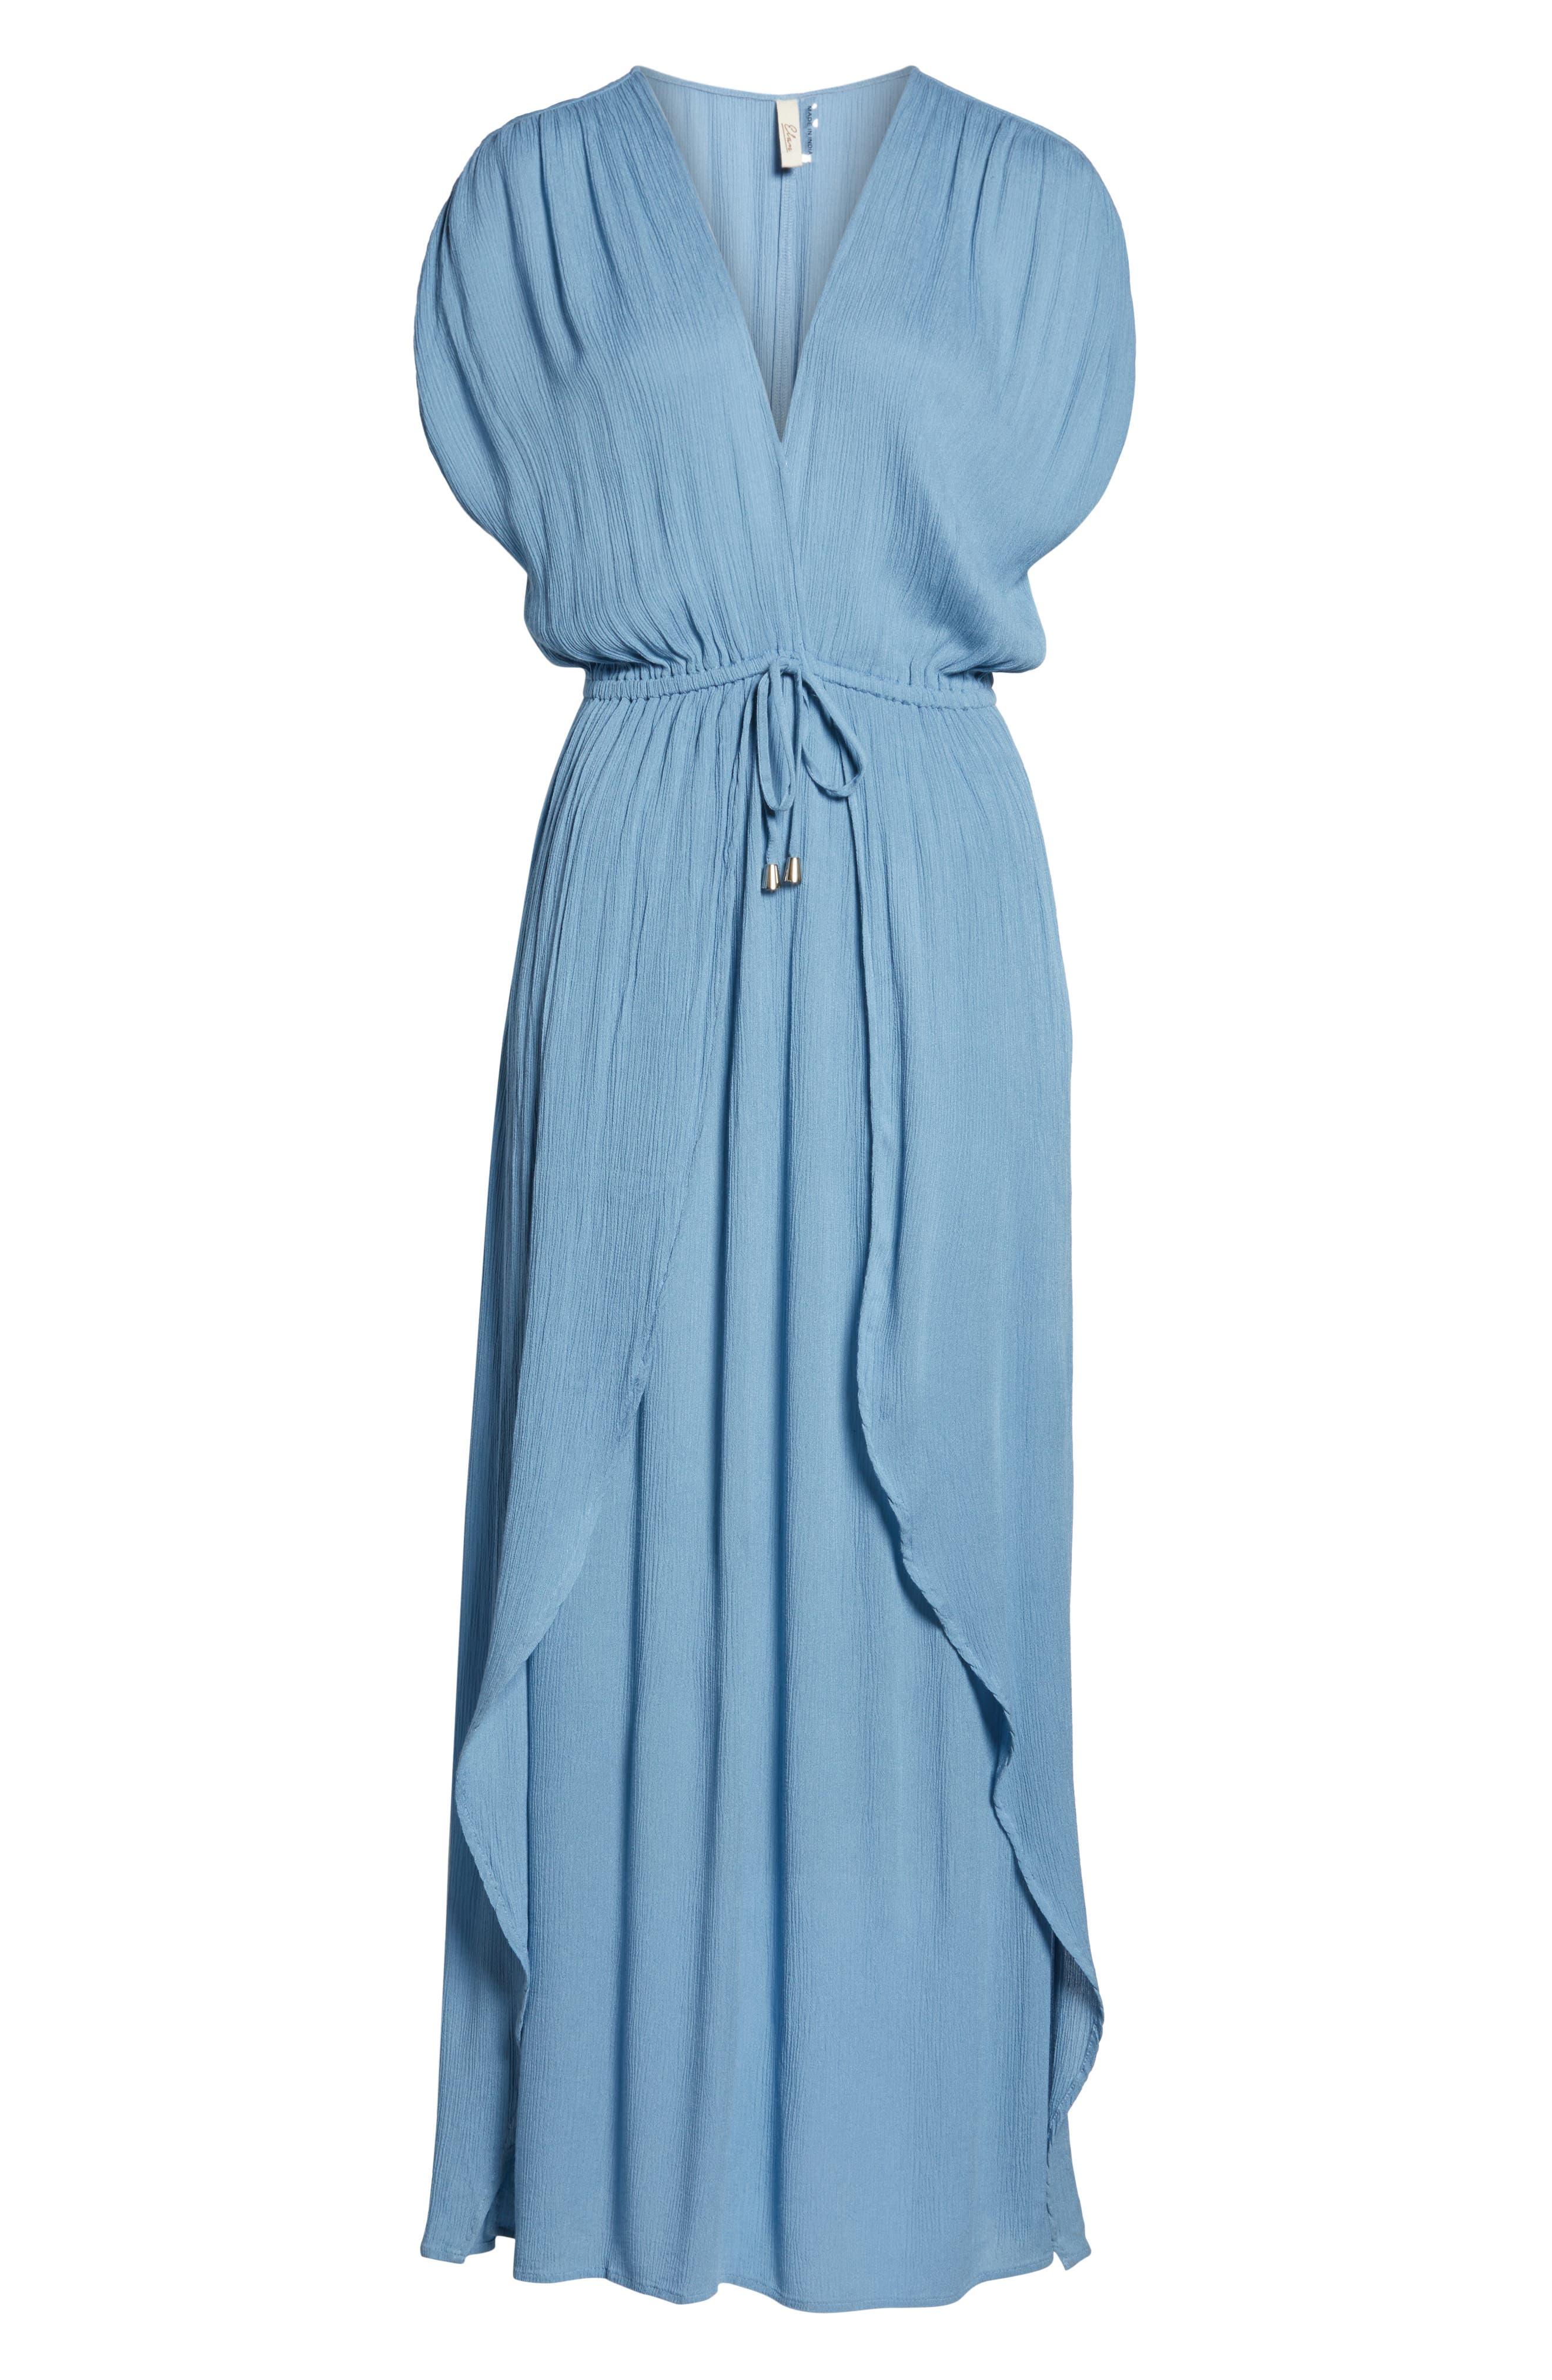 ELAN, Wrap Maxi Cover-Up Dress, Alternate thumbnail 6, color, WASHED BLUE